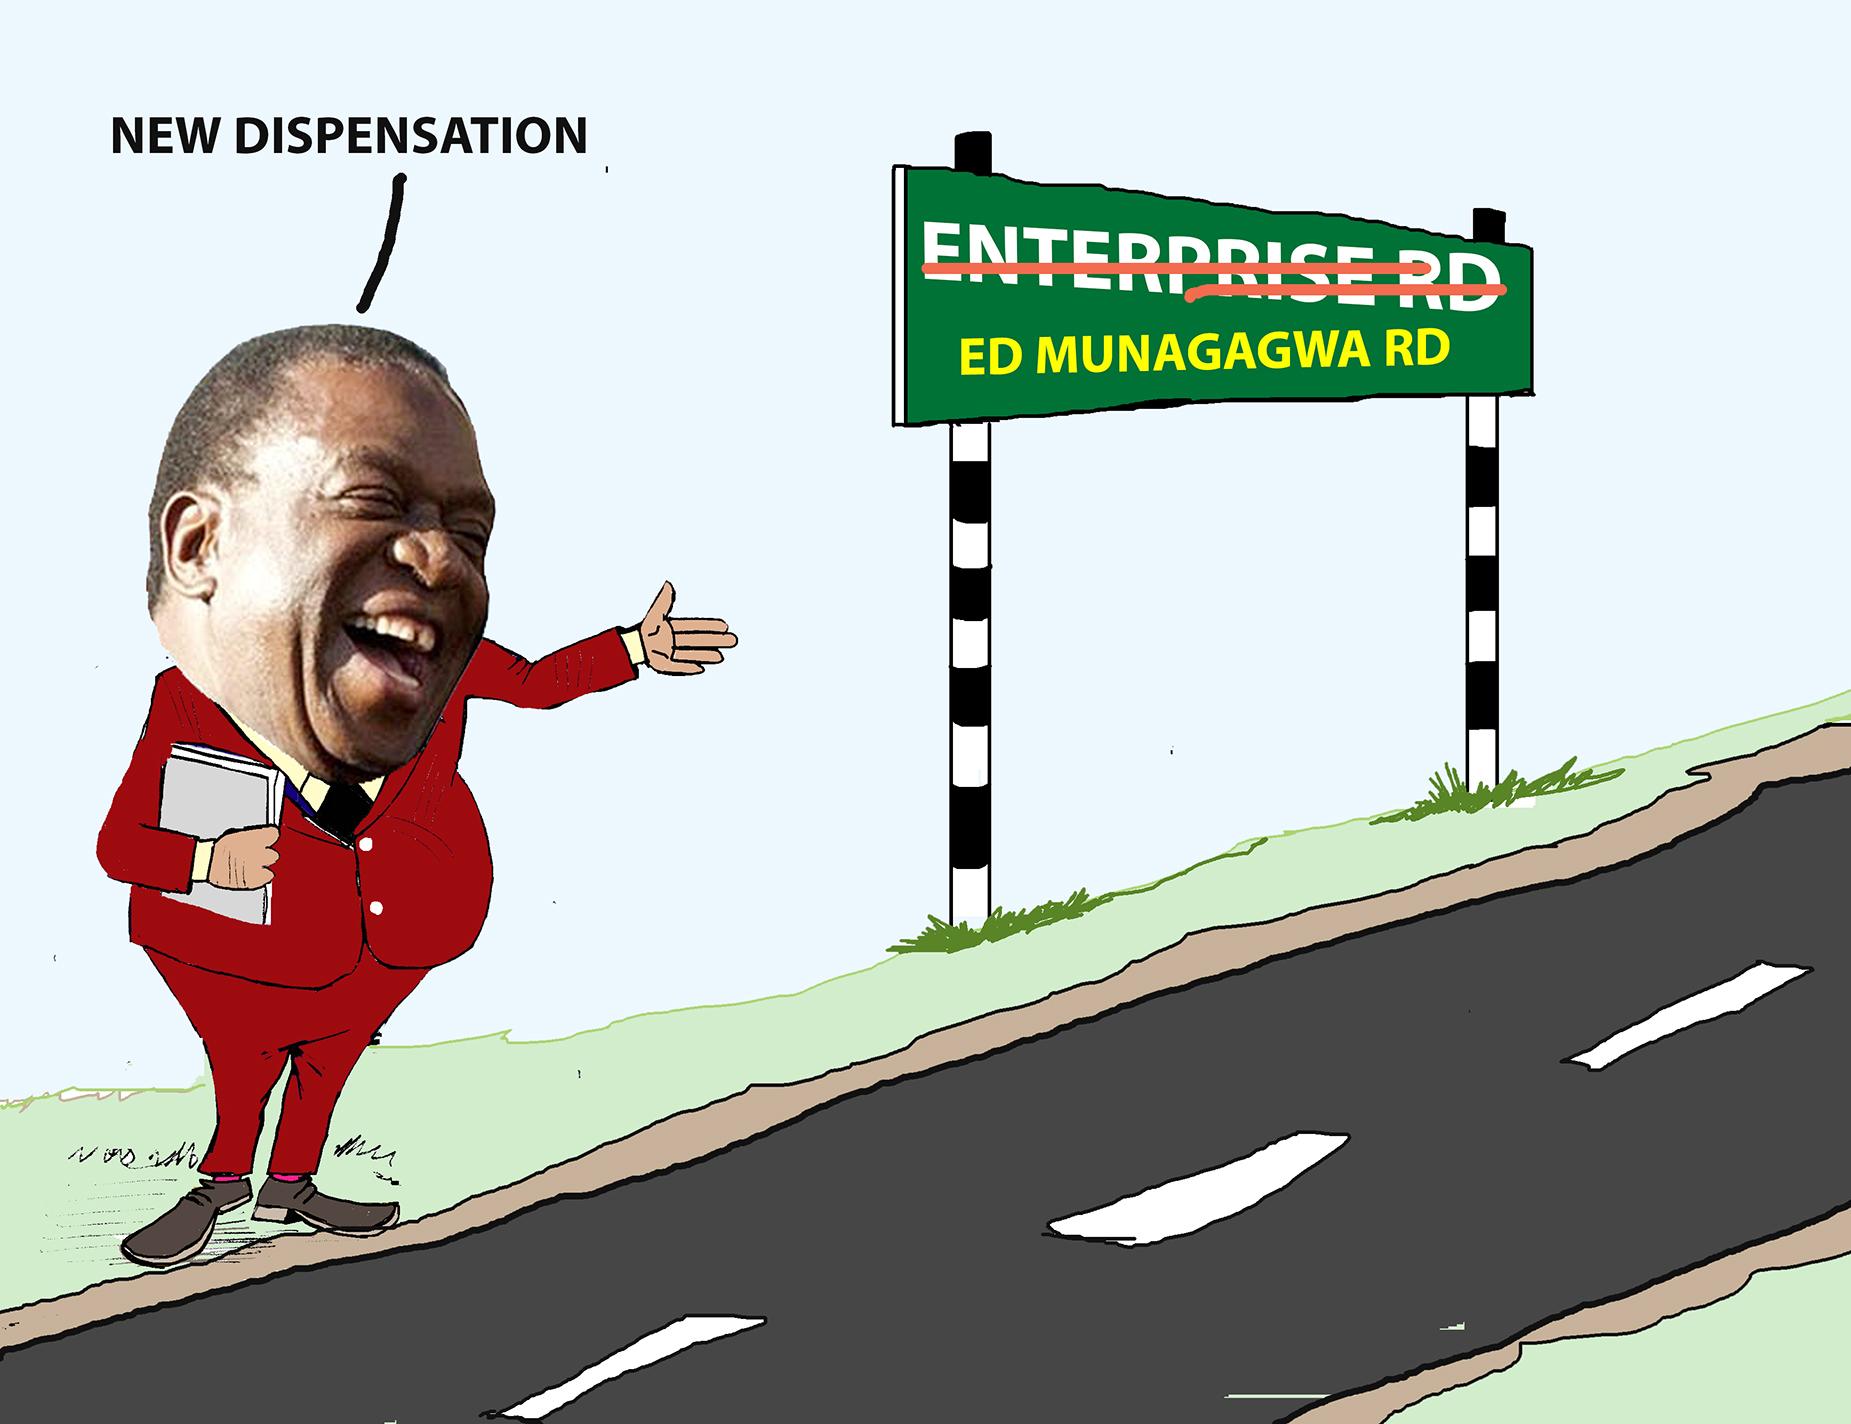 Roads renaming